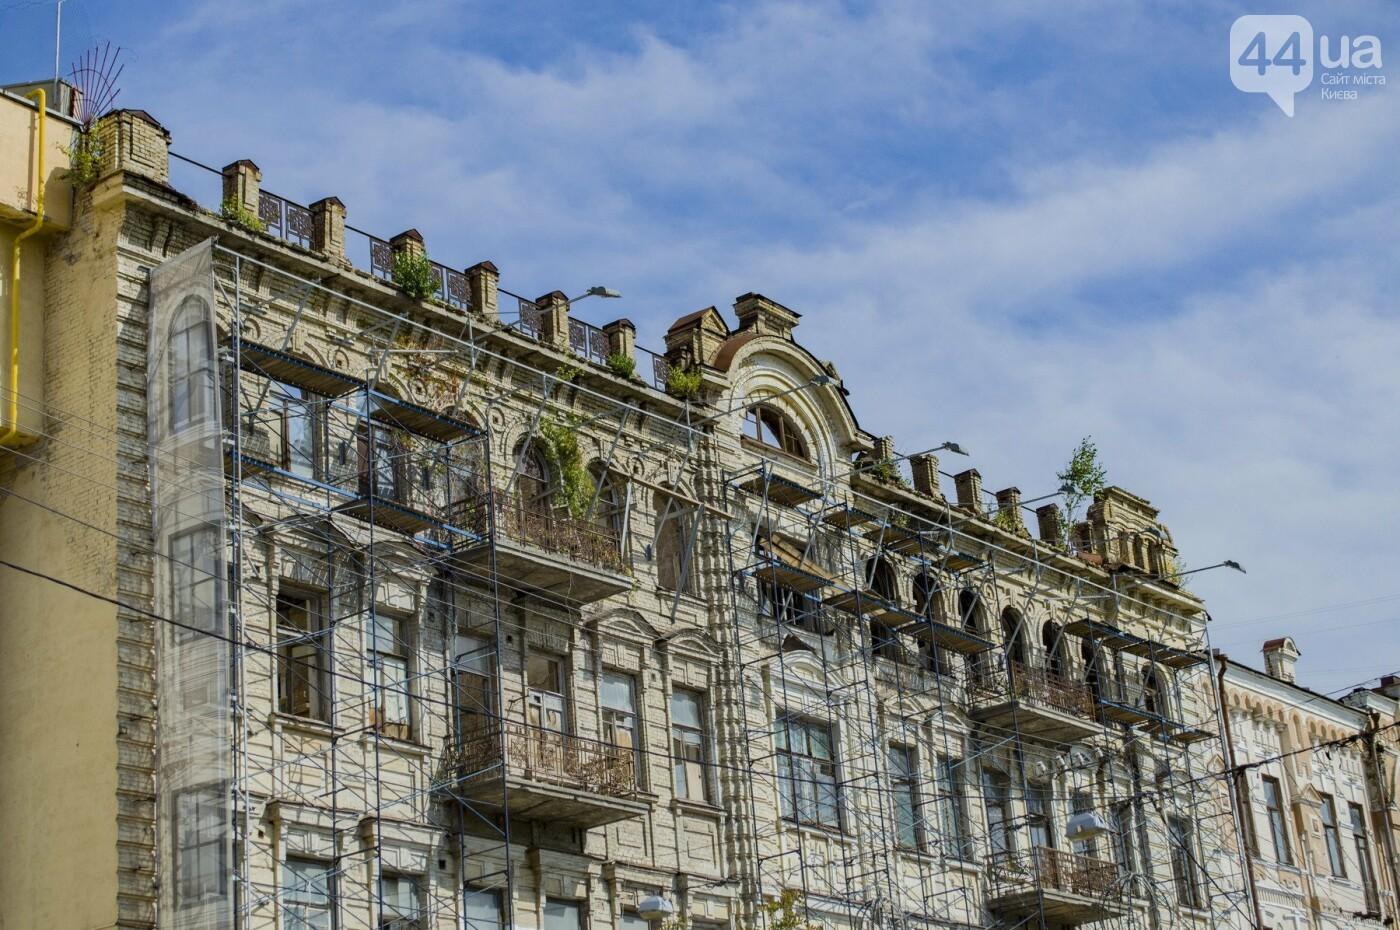 В центре Киева спасут от разрушения исторический дом, фото-4